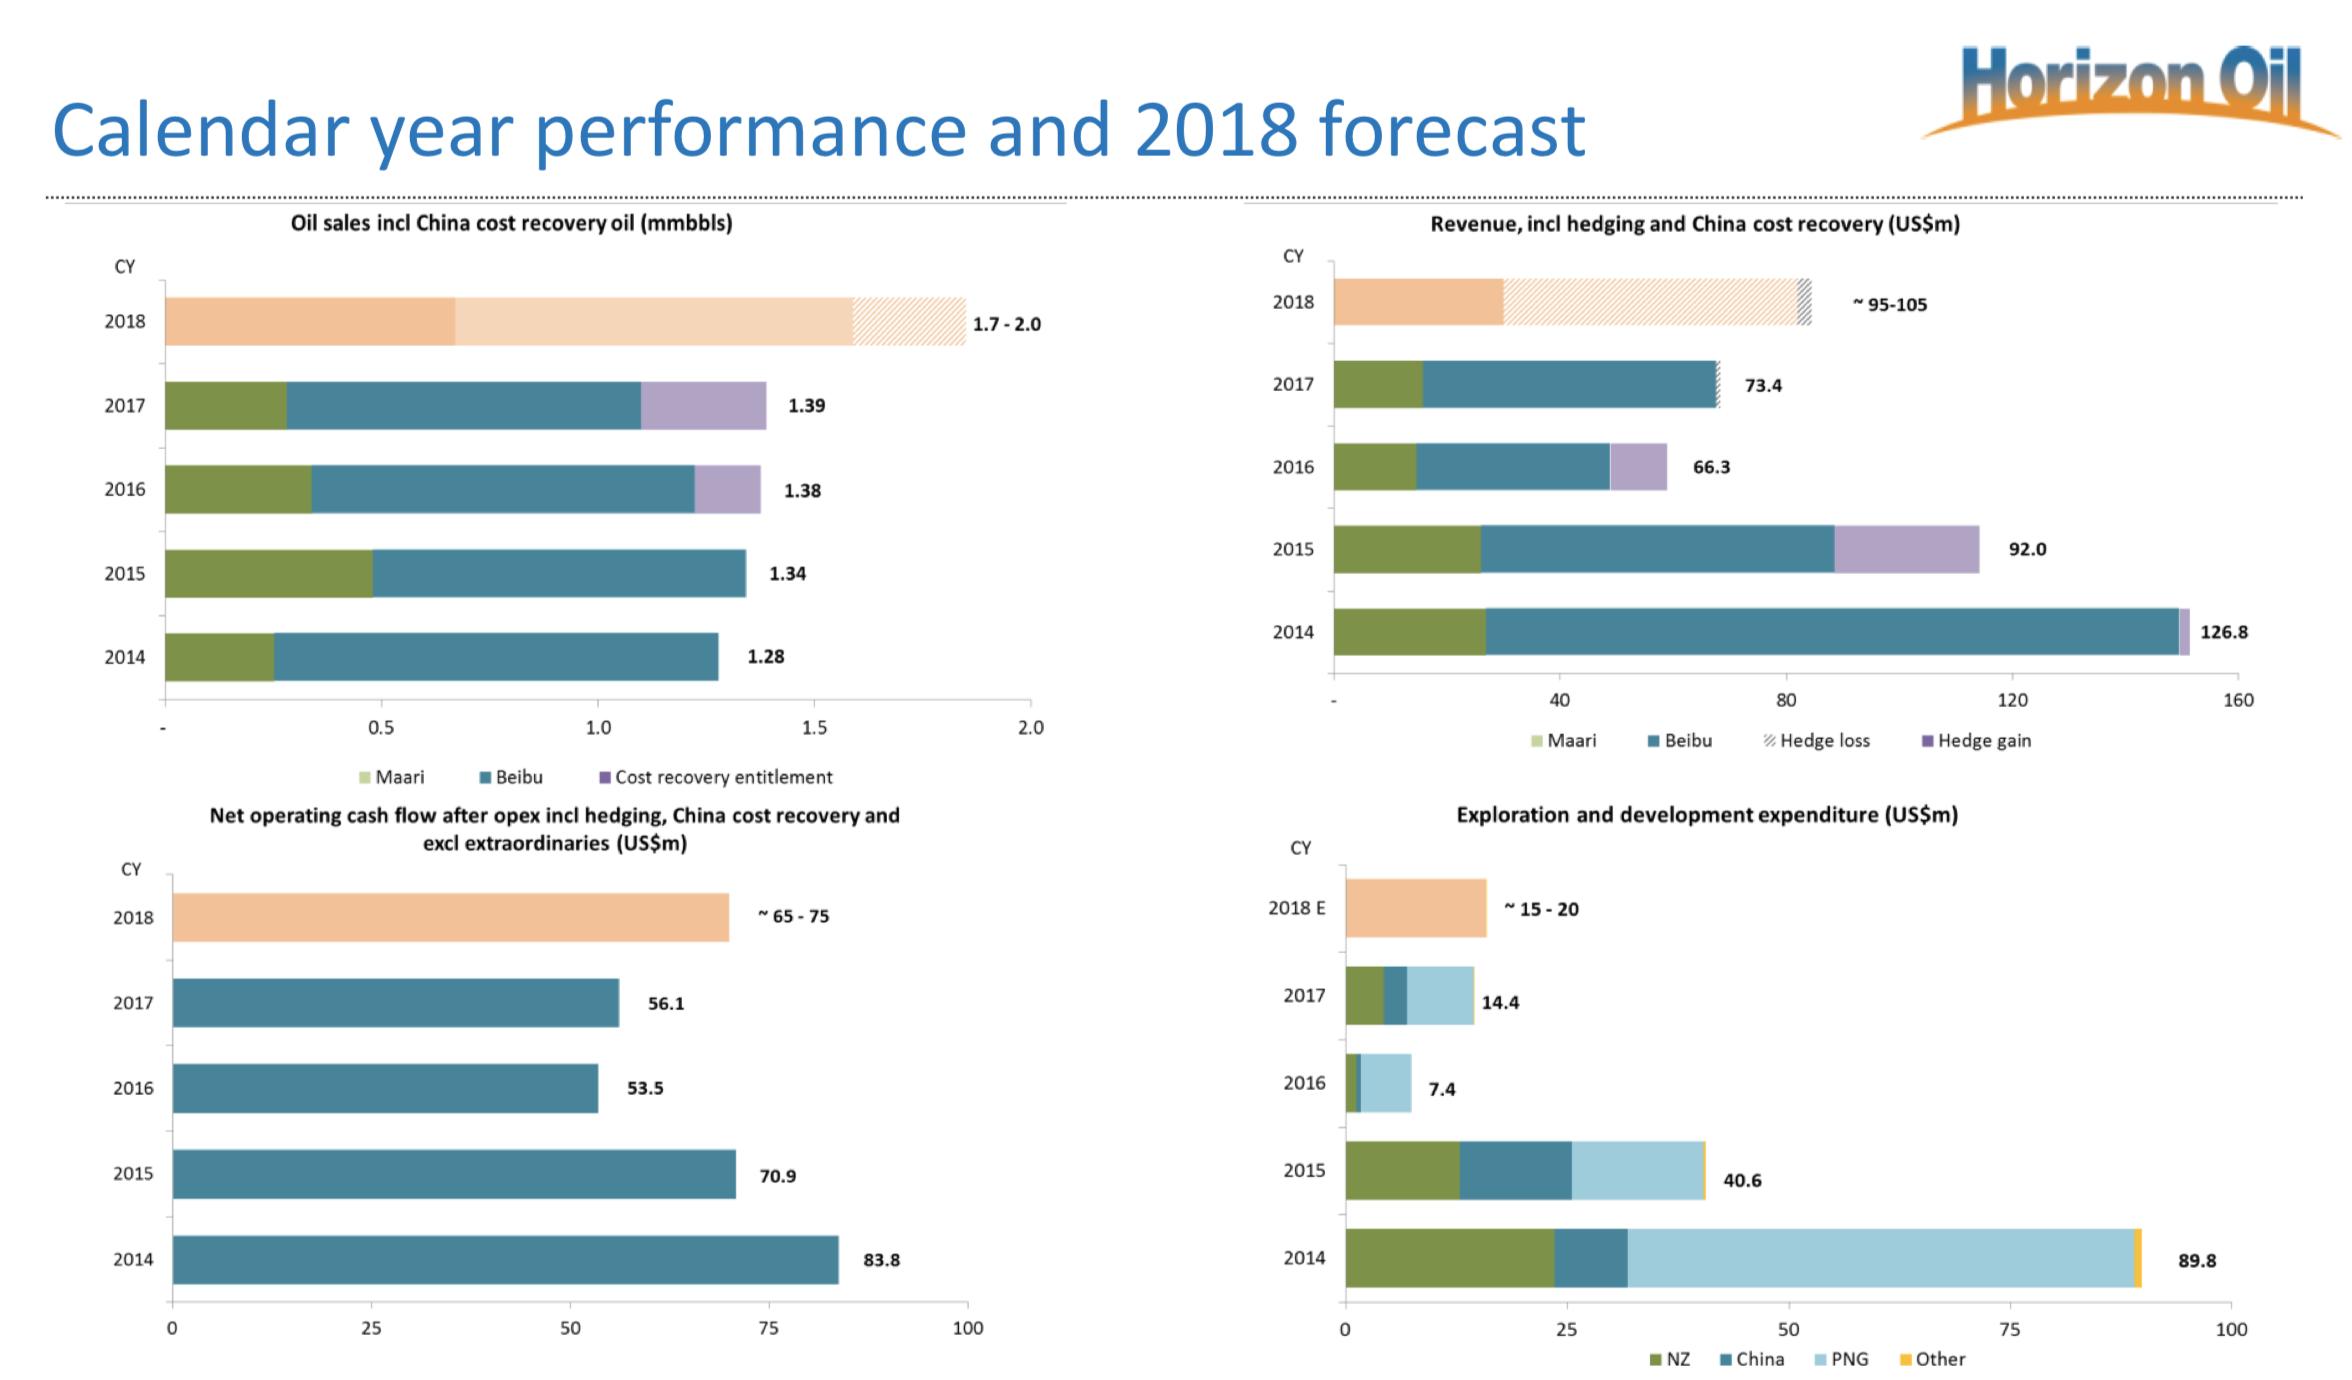 Hzn forecasts